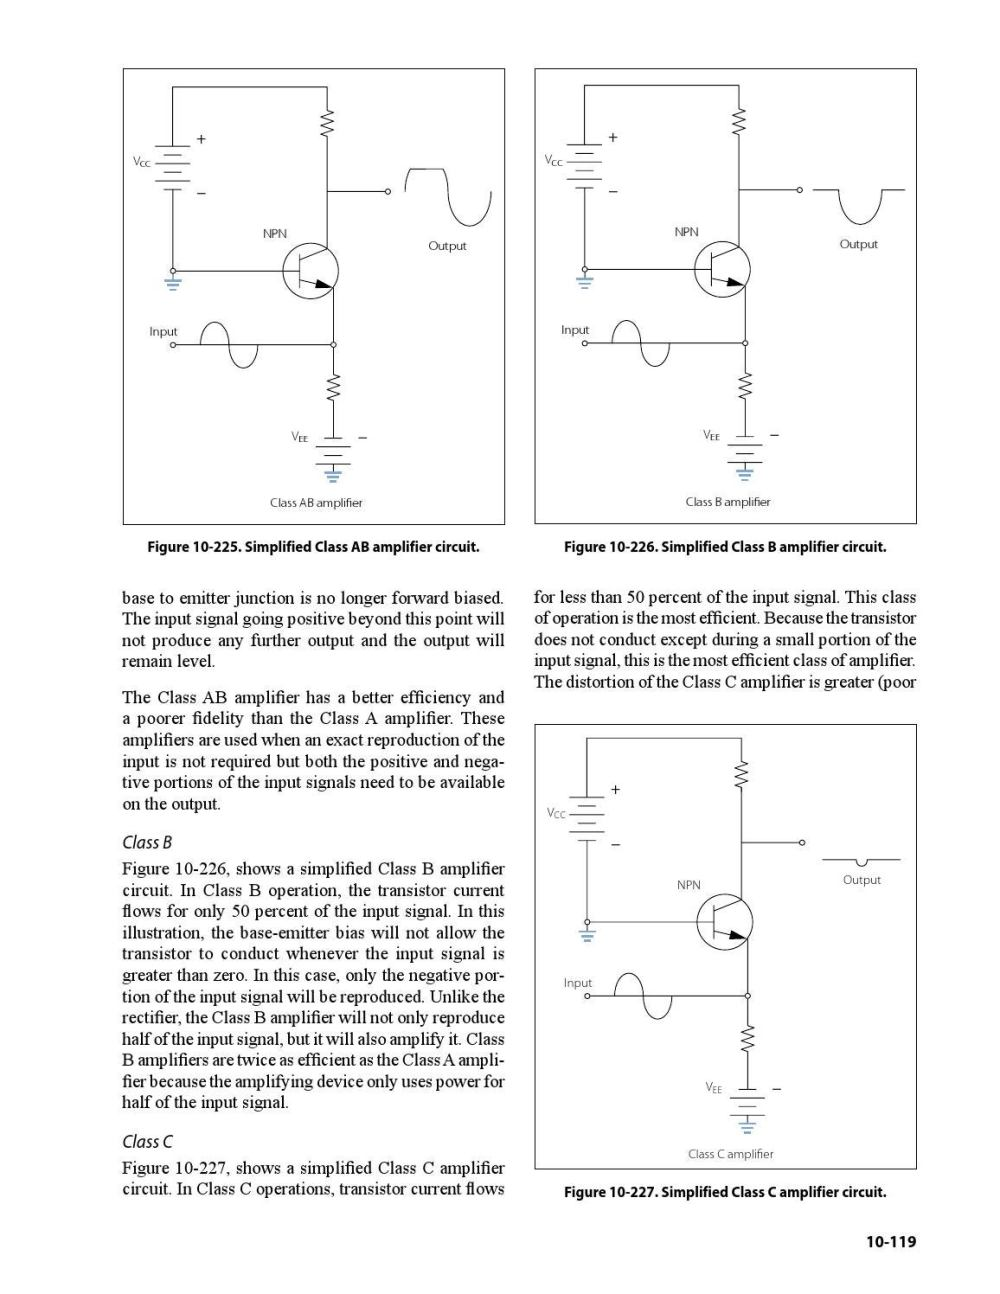 medium resolution of aviation maintenance technician handbook general by ebenezeraviation issuu